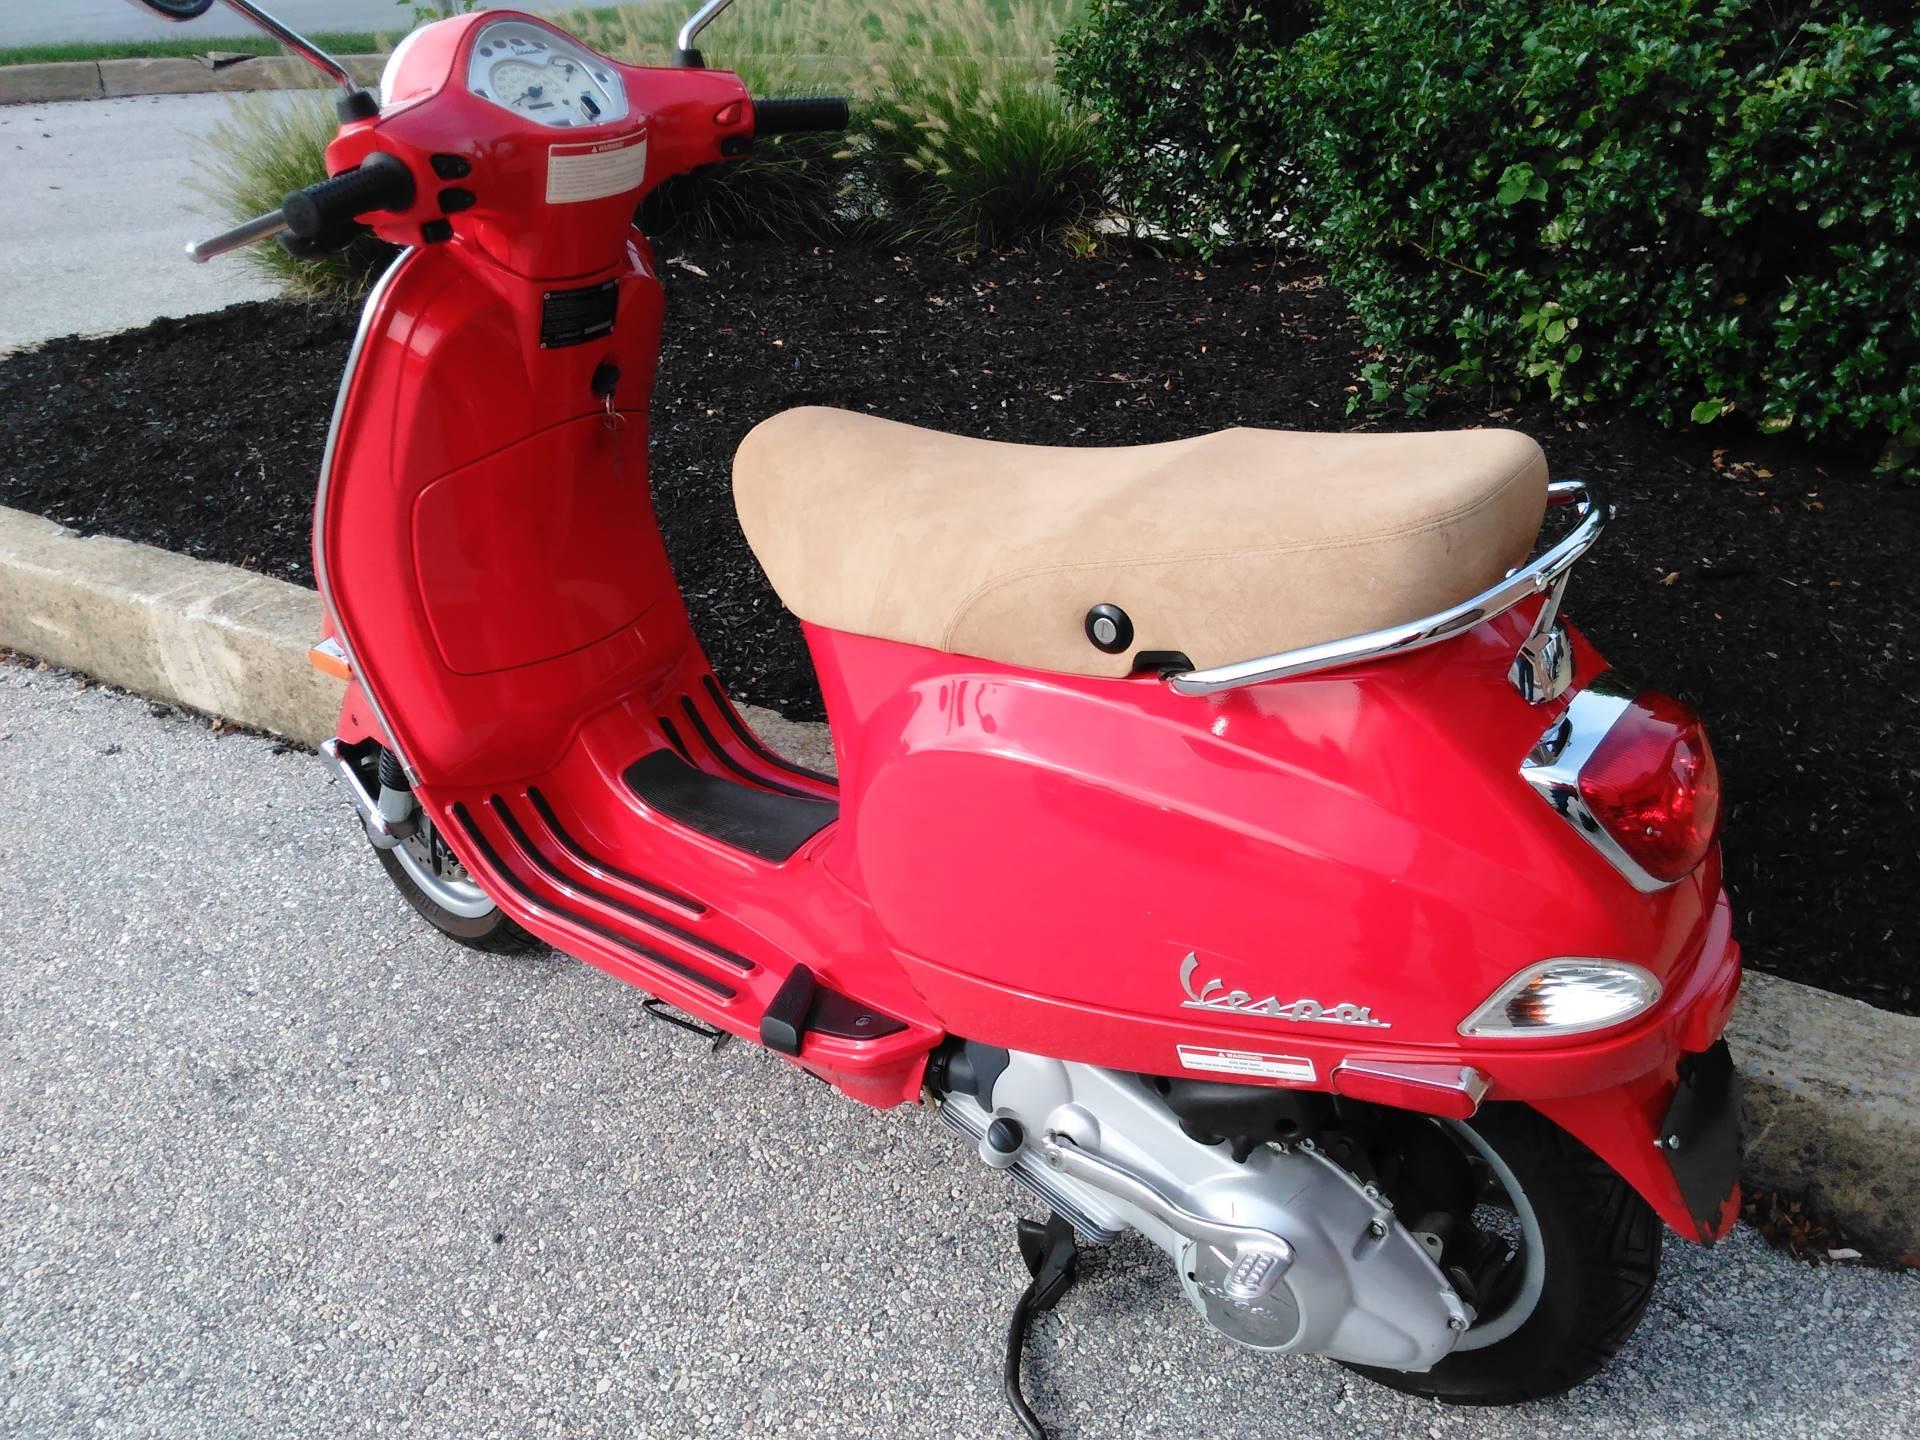 2006 Vespa LX 150 6